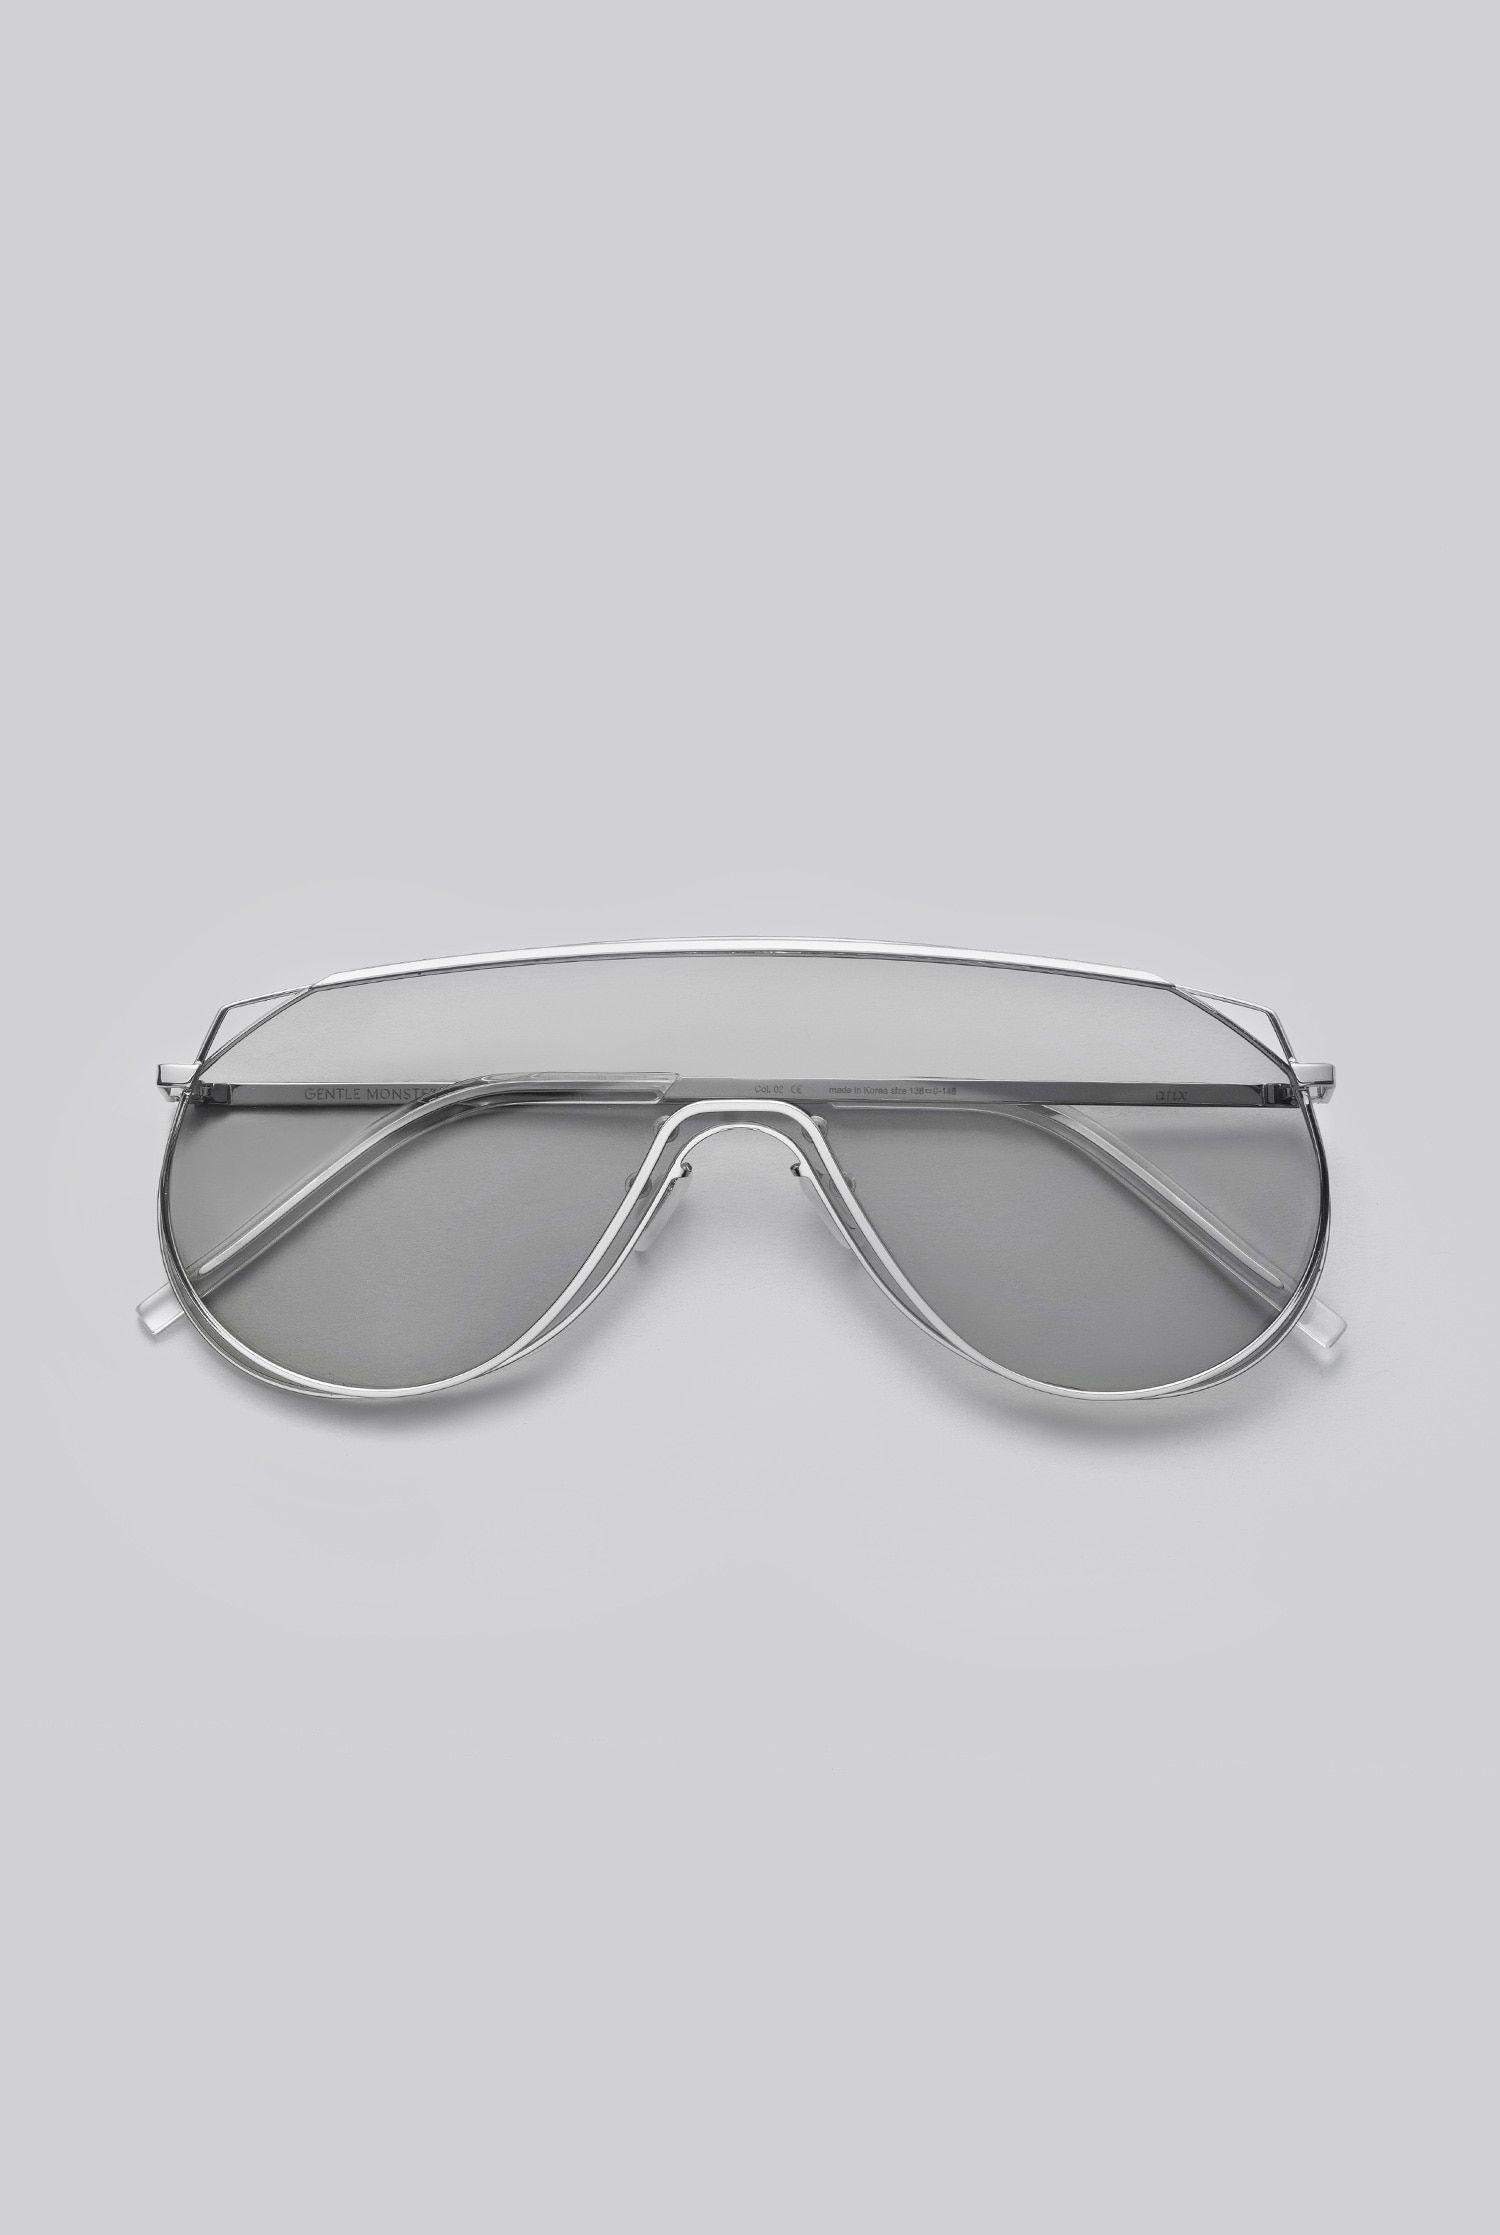 f0bc6579d932 GENTLE MONSTER - AFIX 02(K) Latest Sunglasses